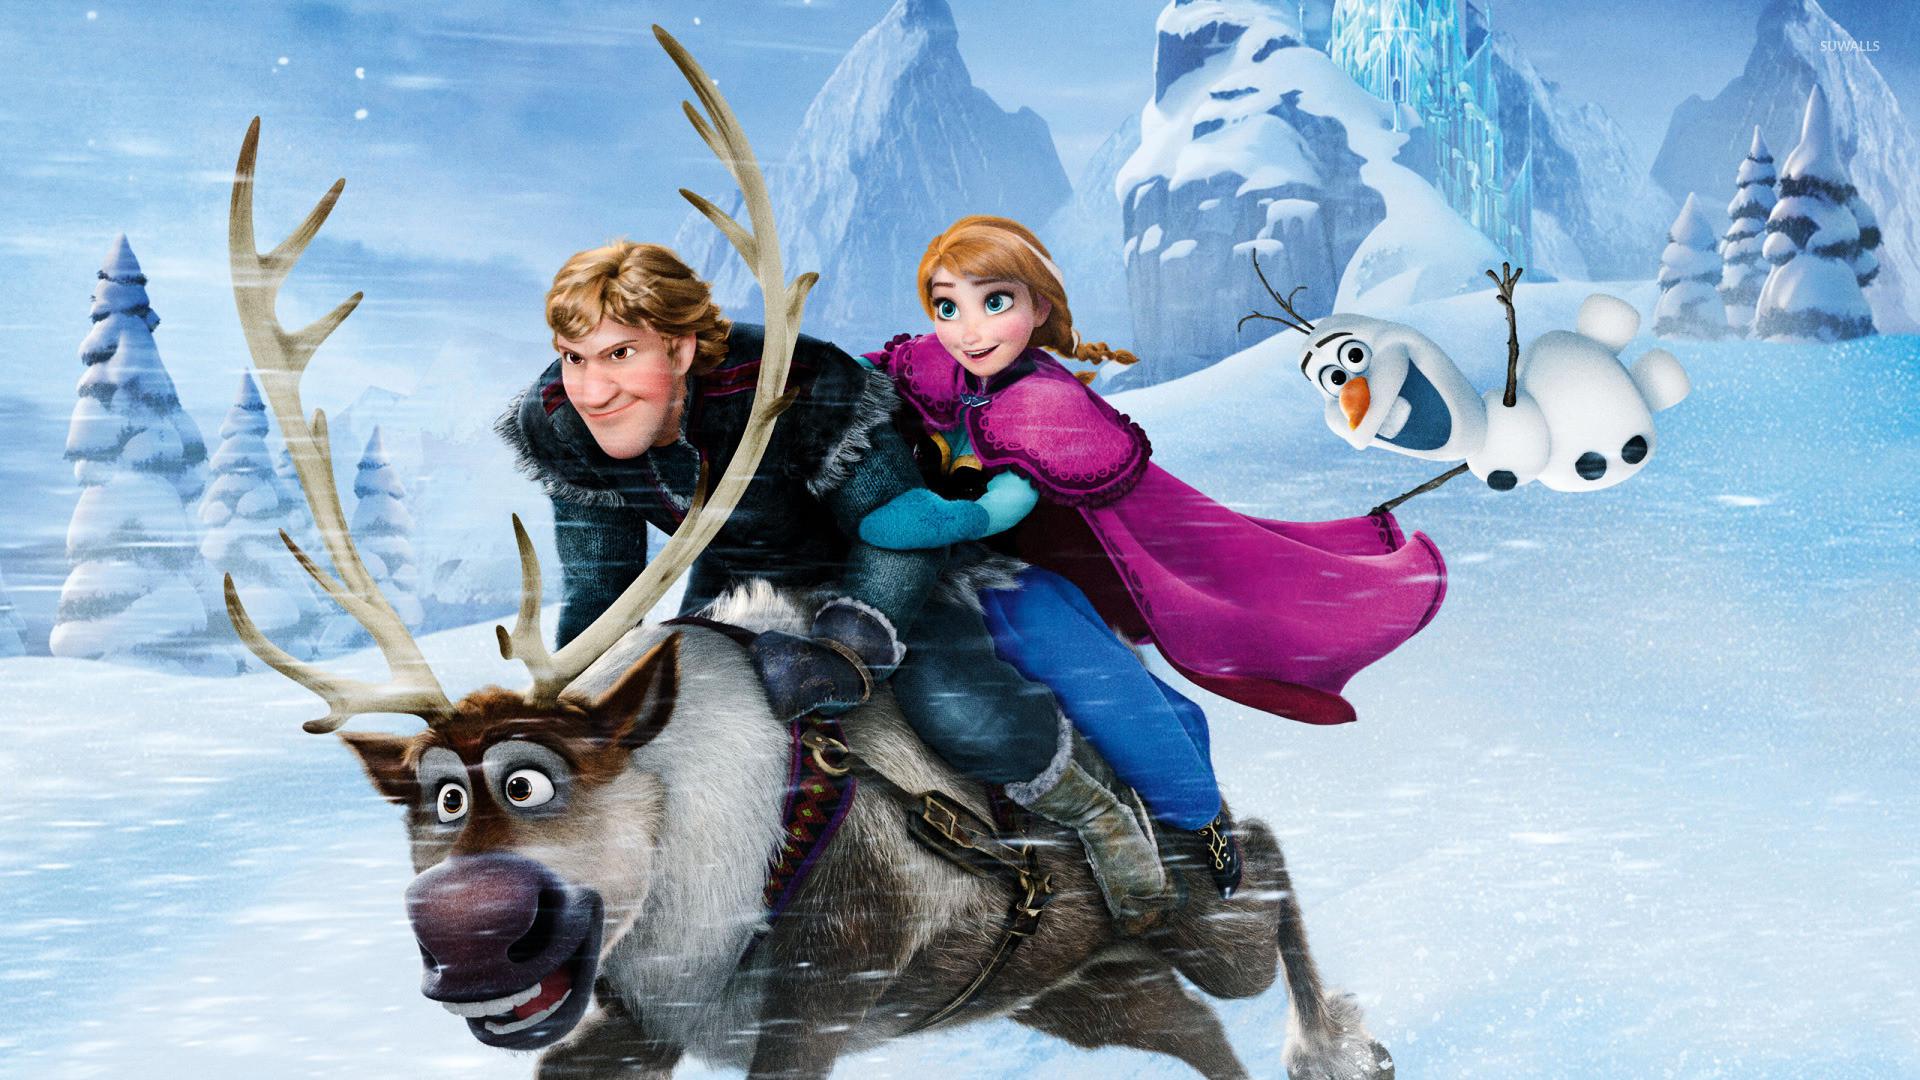 Frozen Cartoon Pictures, Images, Wallpapers